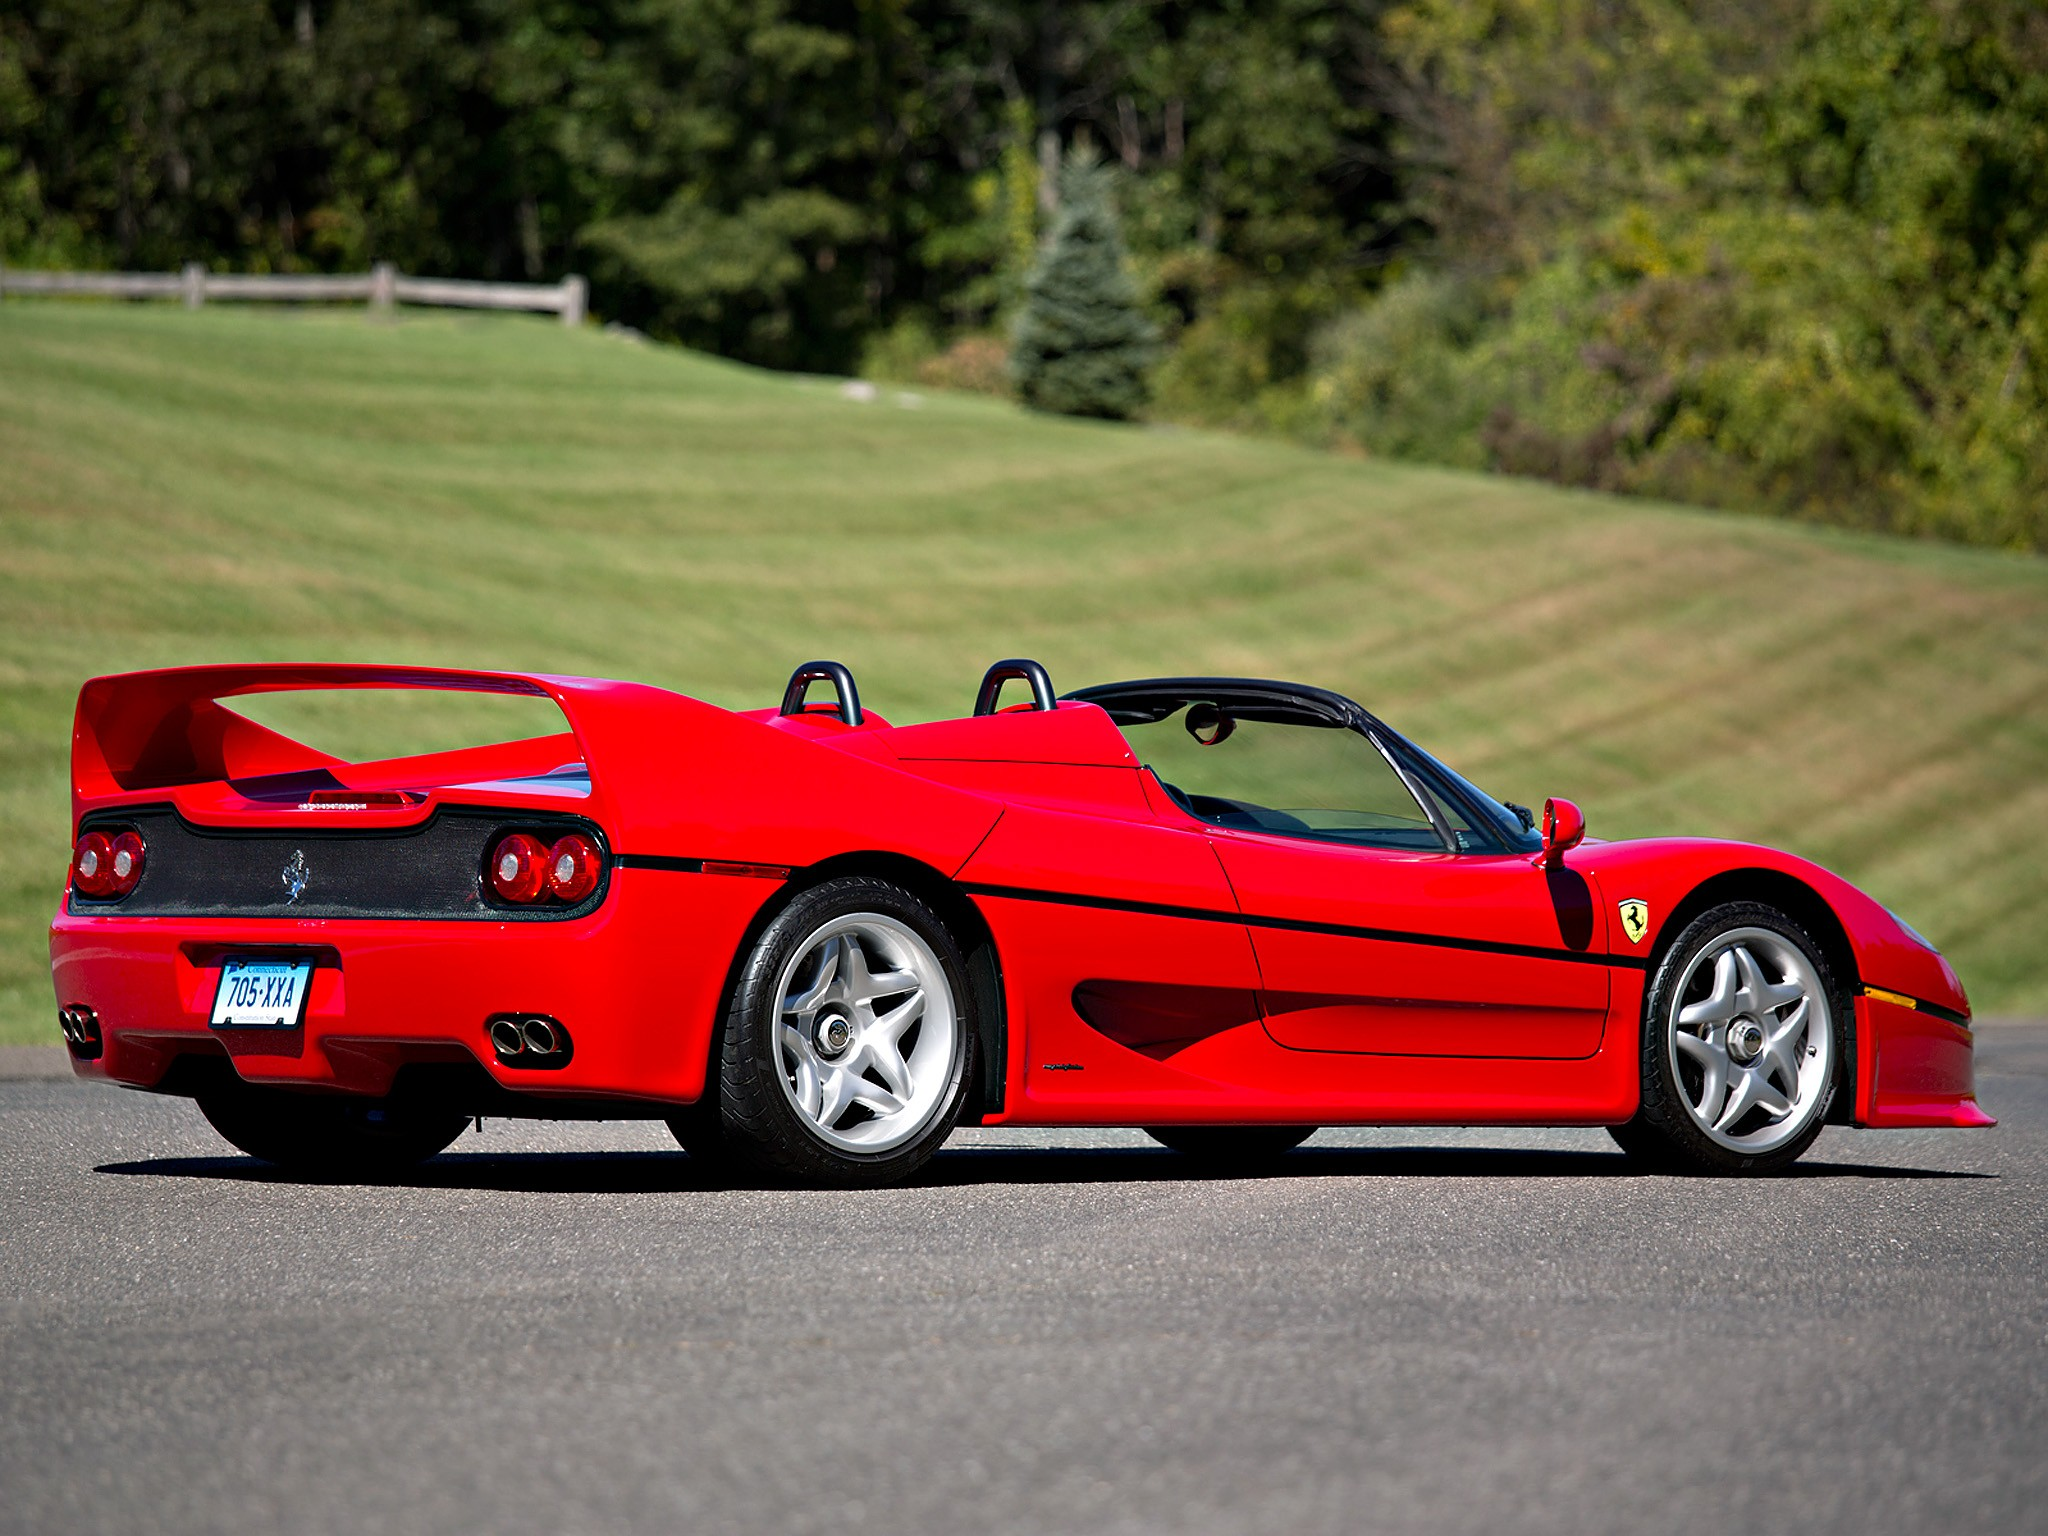 Ferrari f50 wallpaper choice image hd cars wallpaper ferrari f50 specs 1995 1996 1997 autoevolution ferrari f50 1995 1997 vanachro choice image vanachro Choice Image